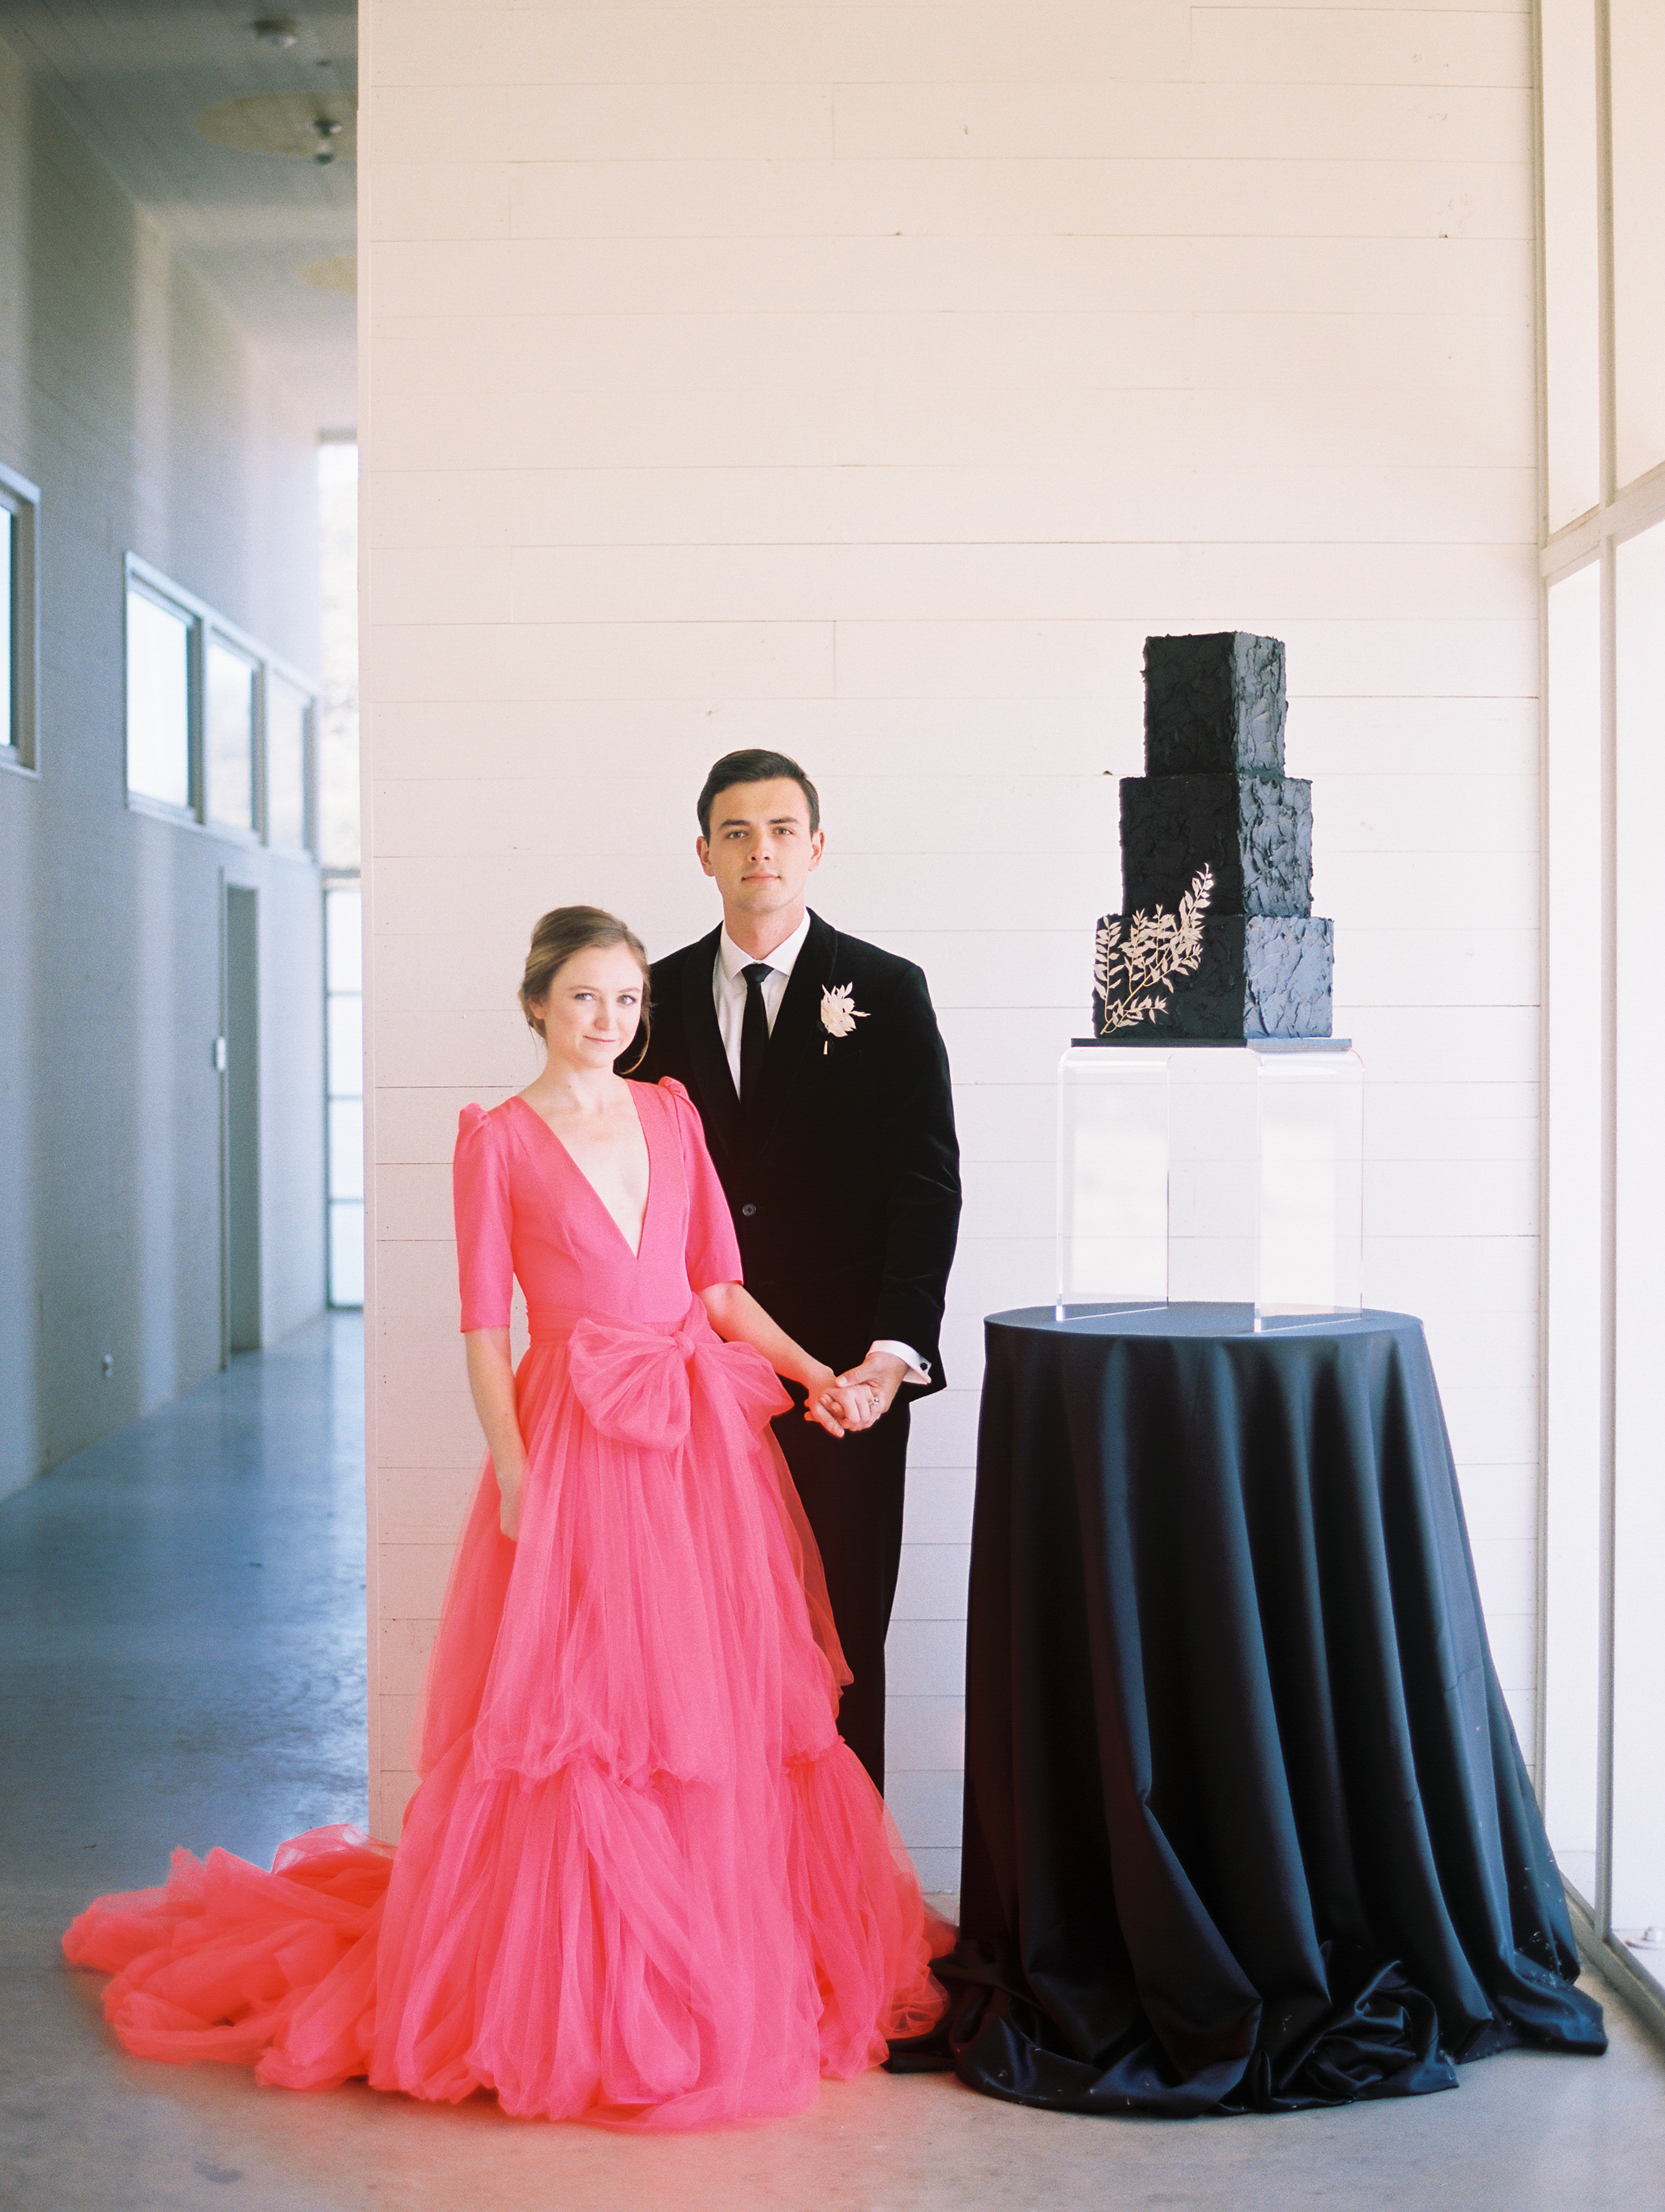 Kristin-La-Voie-Photography-Austin-Wedding-Photographer-Prospect-House-34.jpg